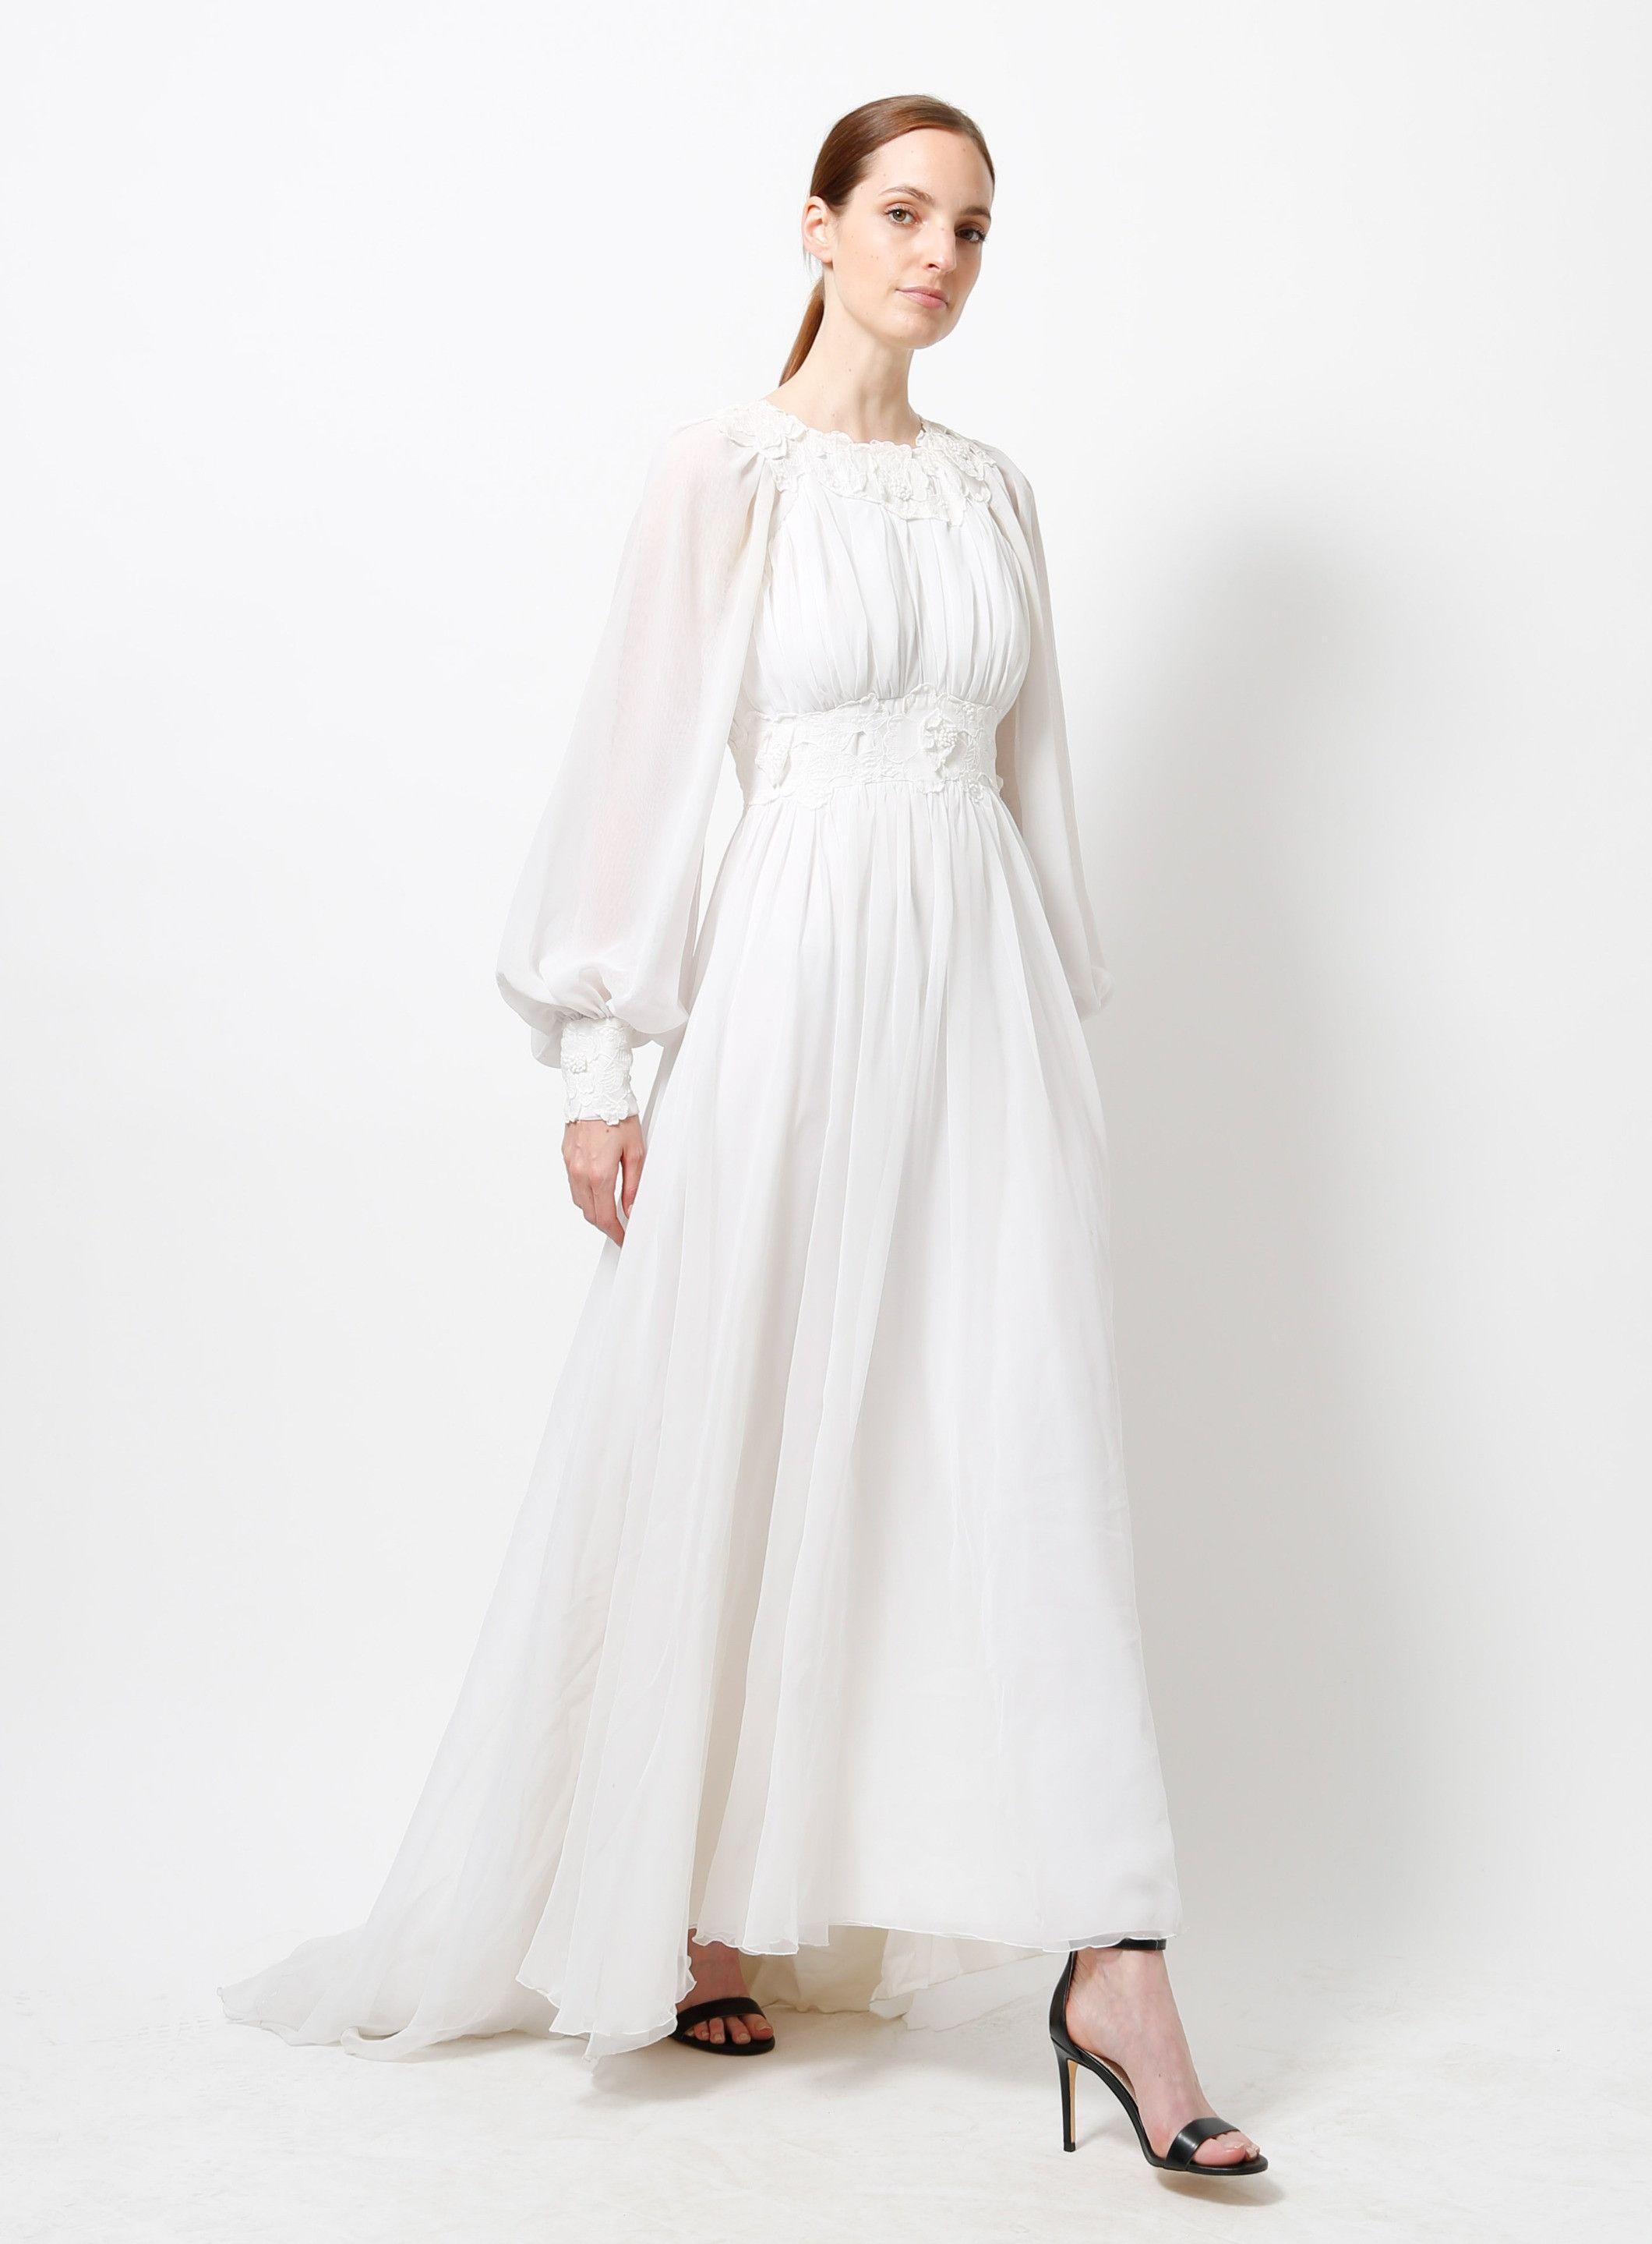 70s Wedding Dress 70s Wedding Dress Embroidered Wedding Dress Dresses [ 2879 x 2120 Pixel ]